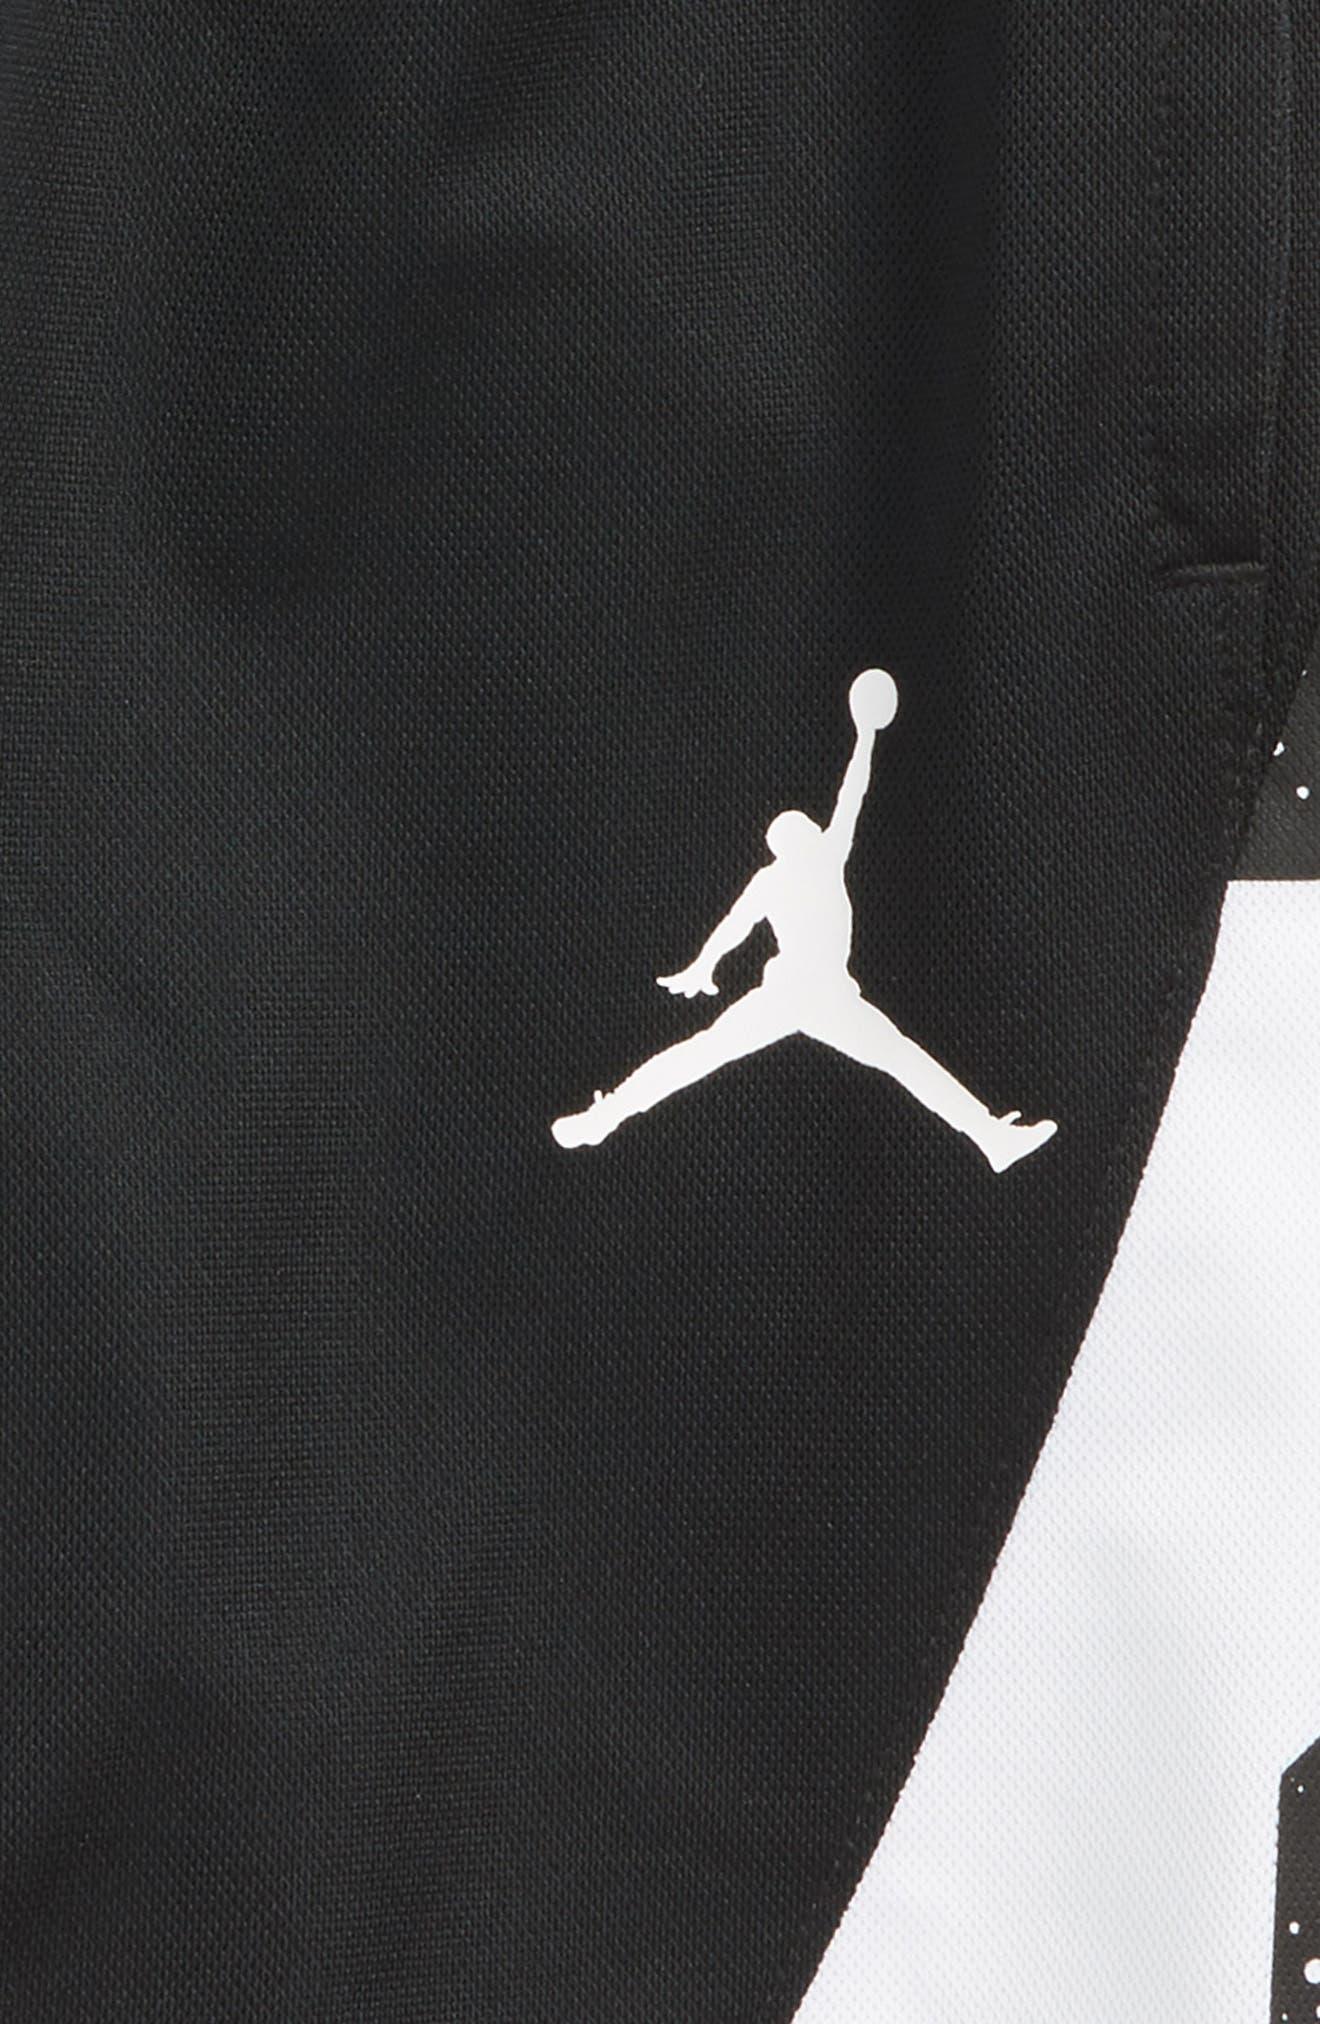 Jordan Dry Speckle 23 Training Shorts,                             Alternate thumbnail 3, color,                             001